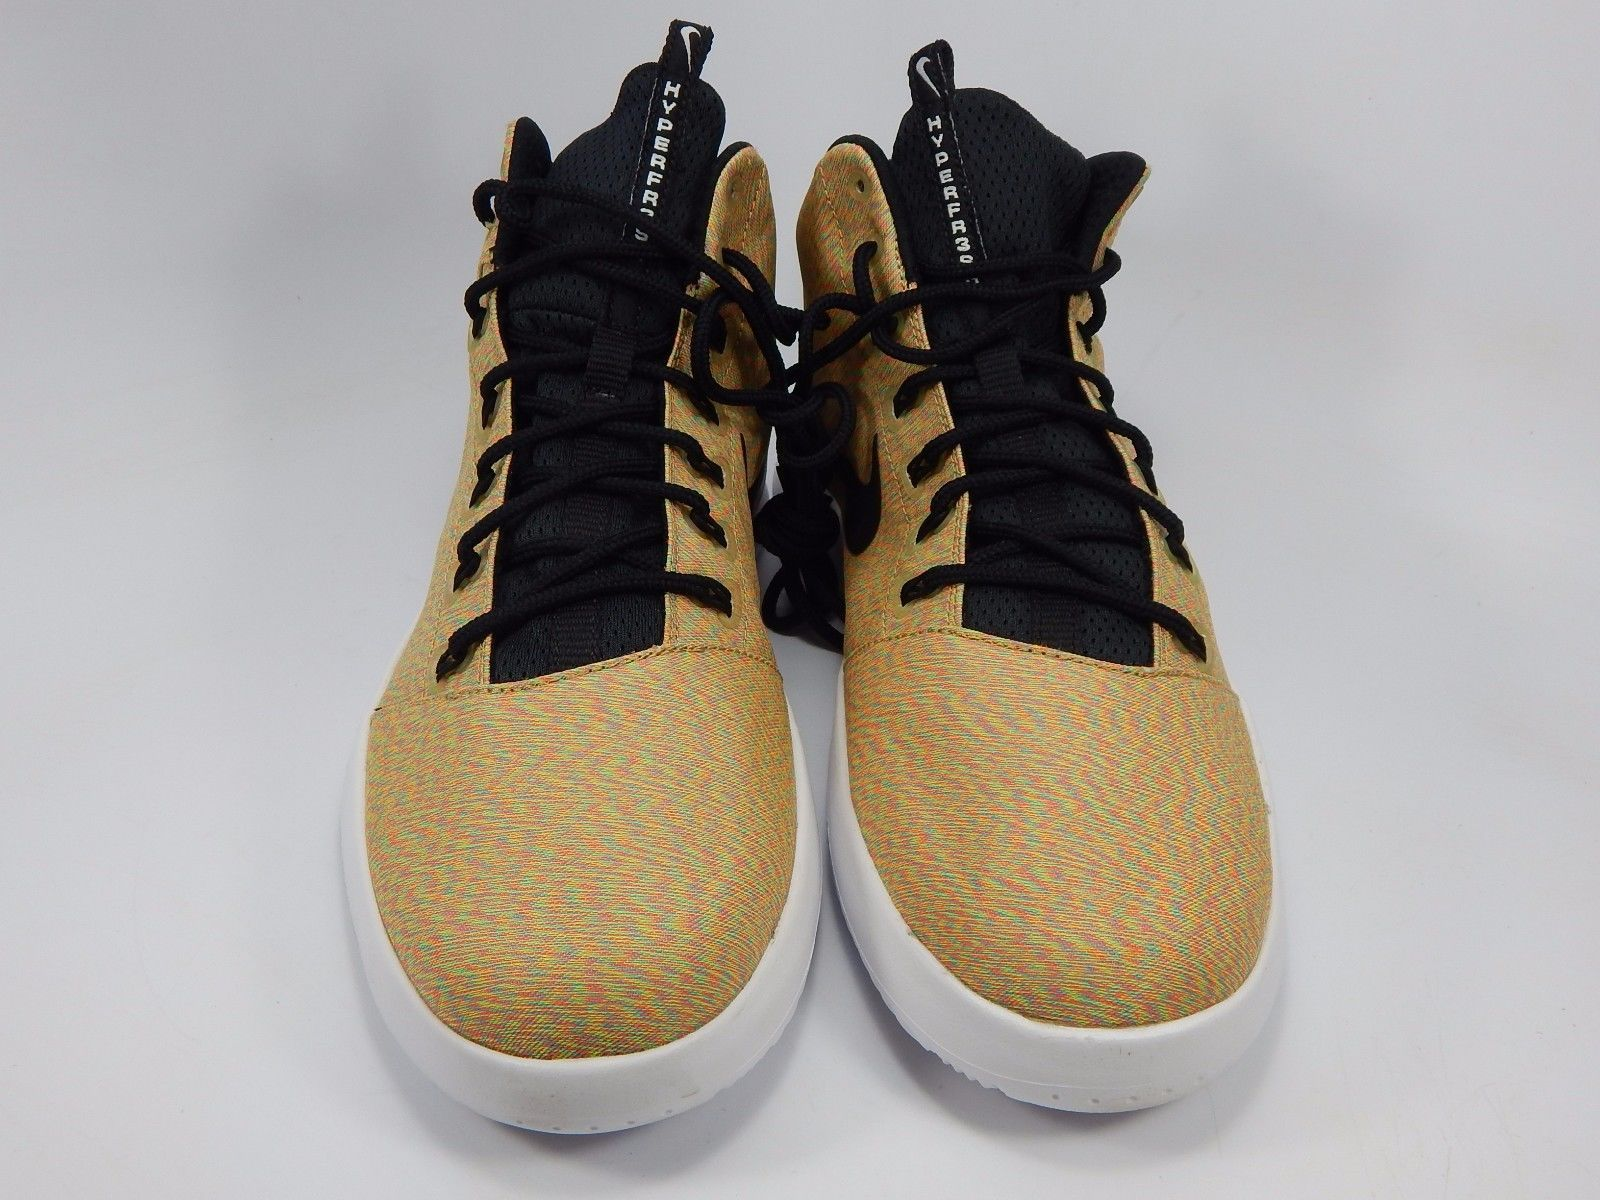 Nike Hyperfr3sh Mid Top Men's Basketball Shoes Size US 10 M (D) EU 44 759996-301